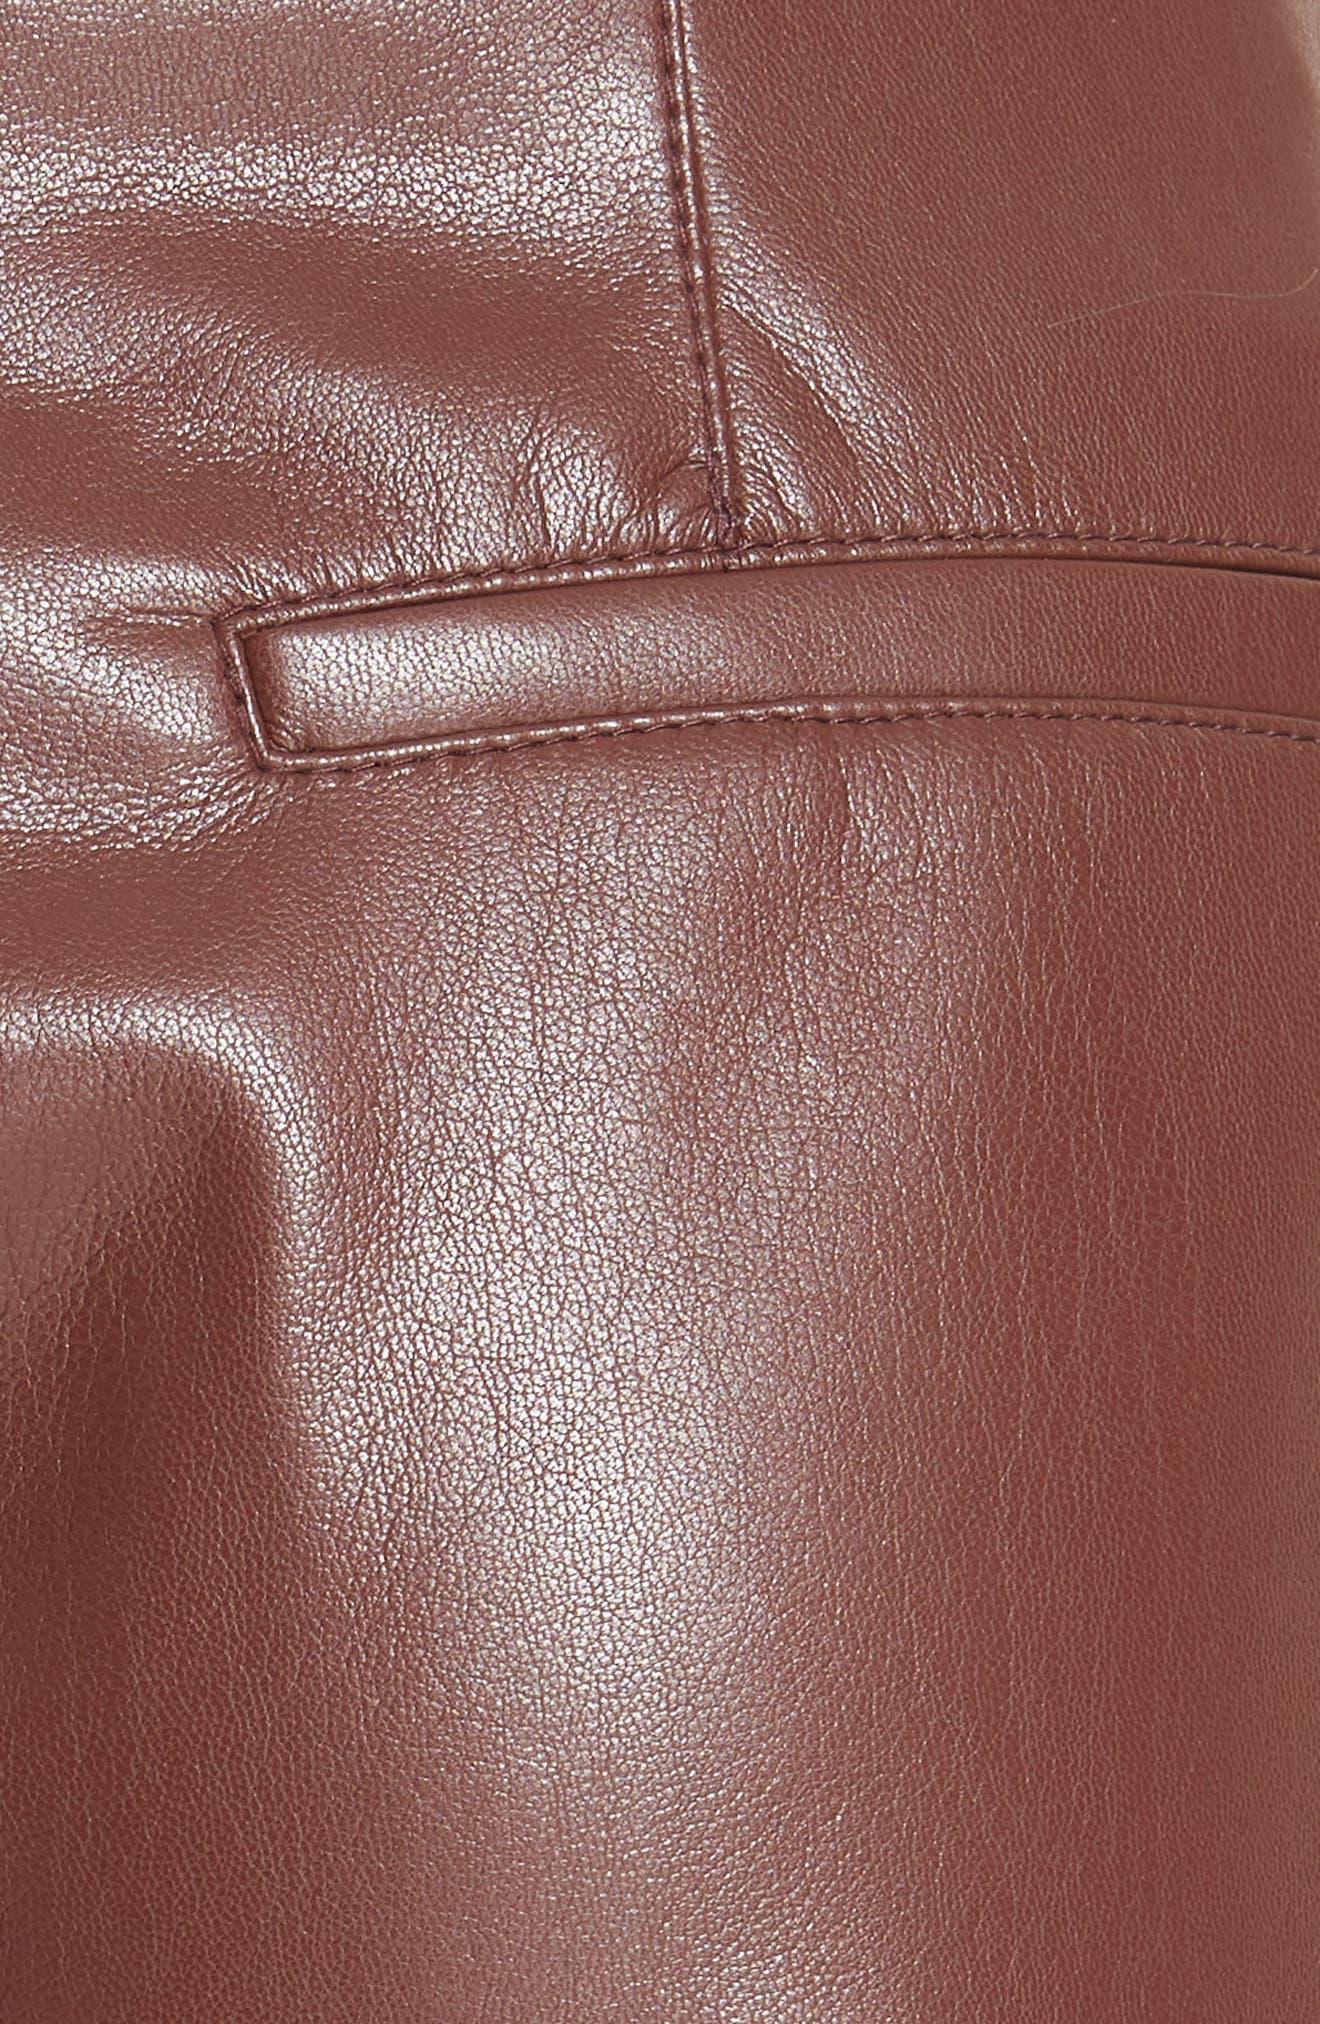 Africa Faux Leather Wide Leg Crop Pants,                             Alternate thumbnail 5, color,                             509